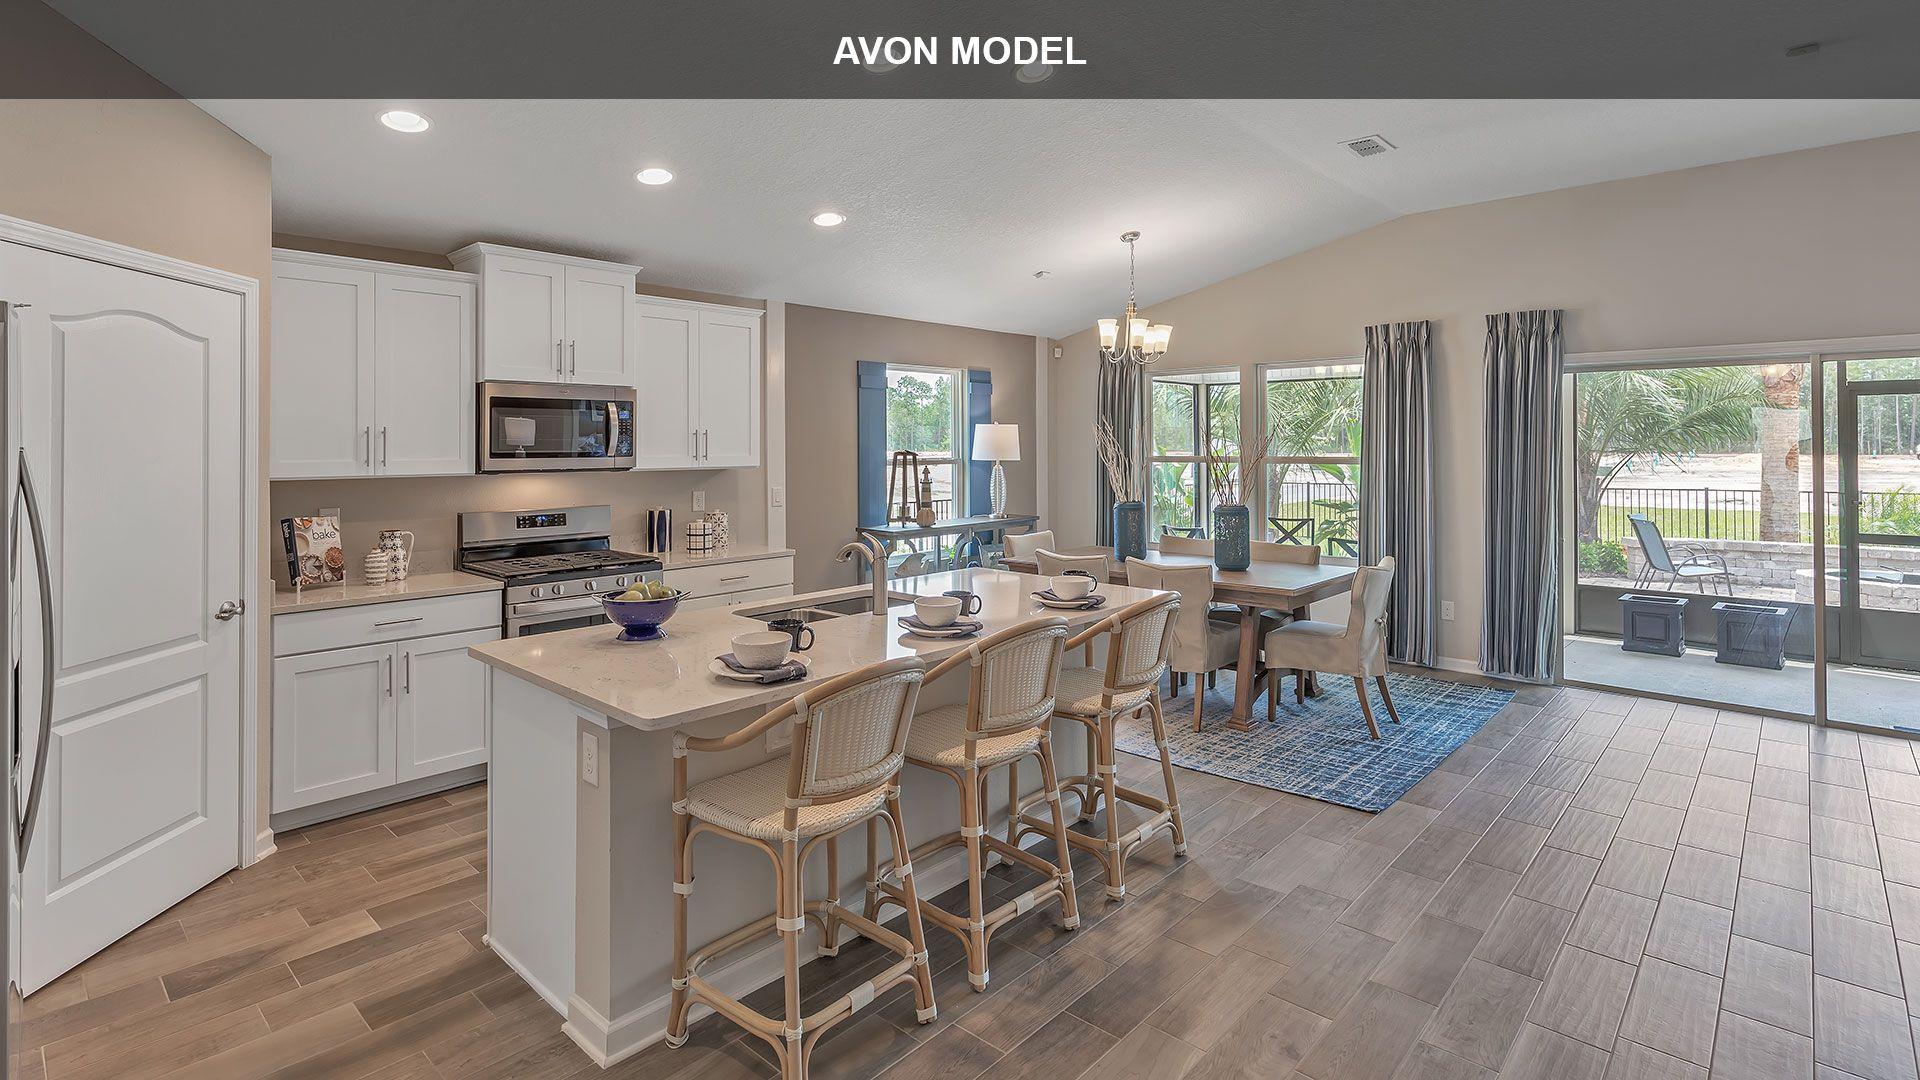 Kitchen featured in the AVON By D.R. Horton in Jacksonville-St. Augustine, FL